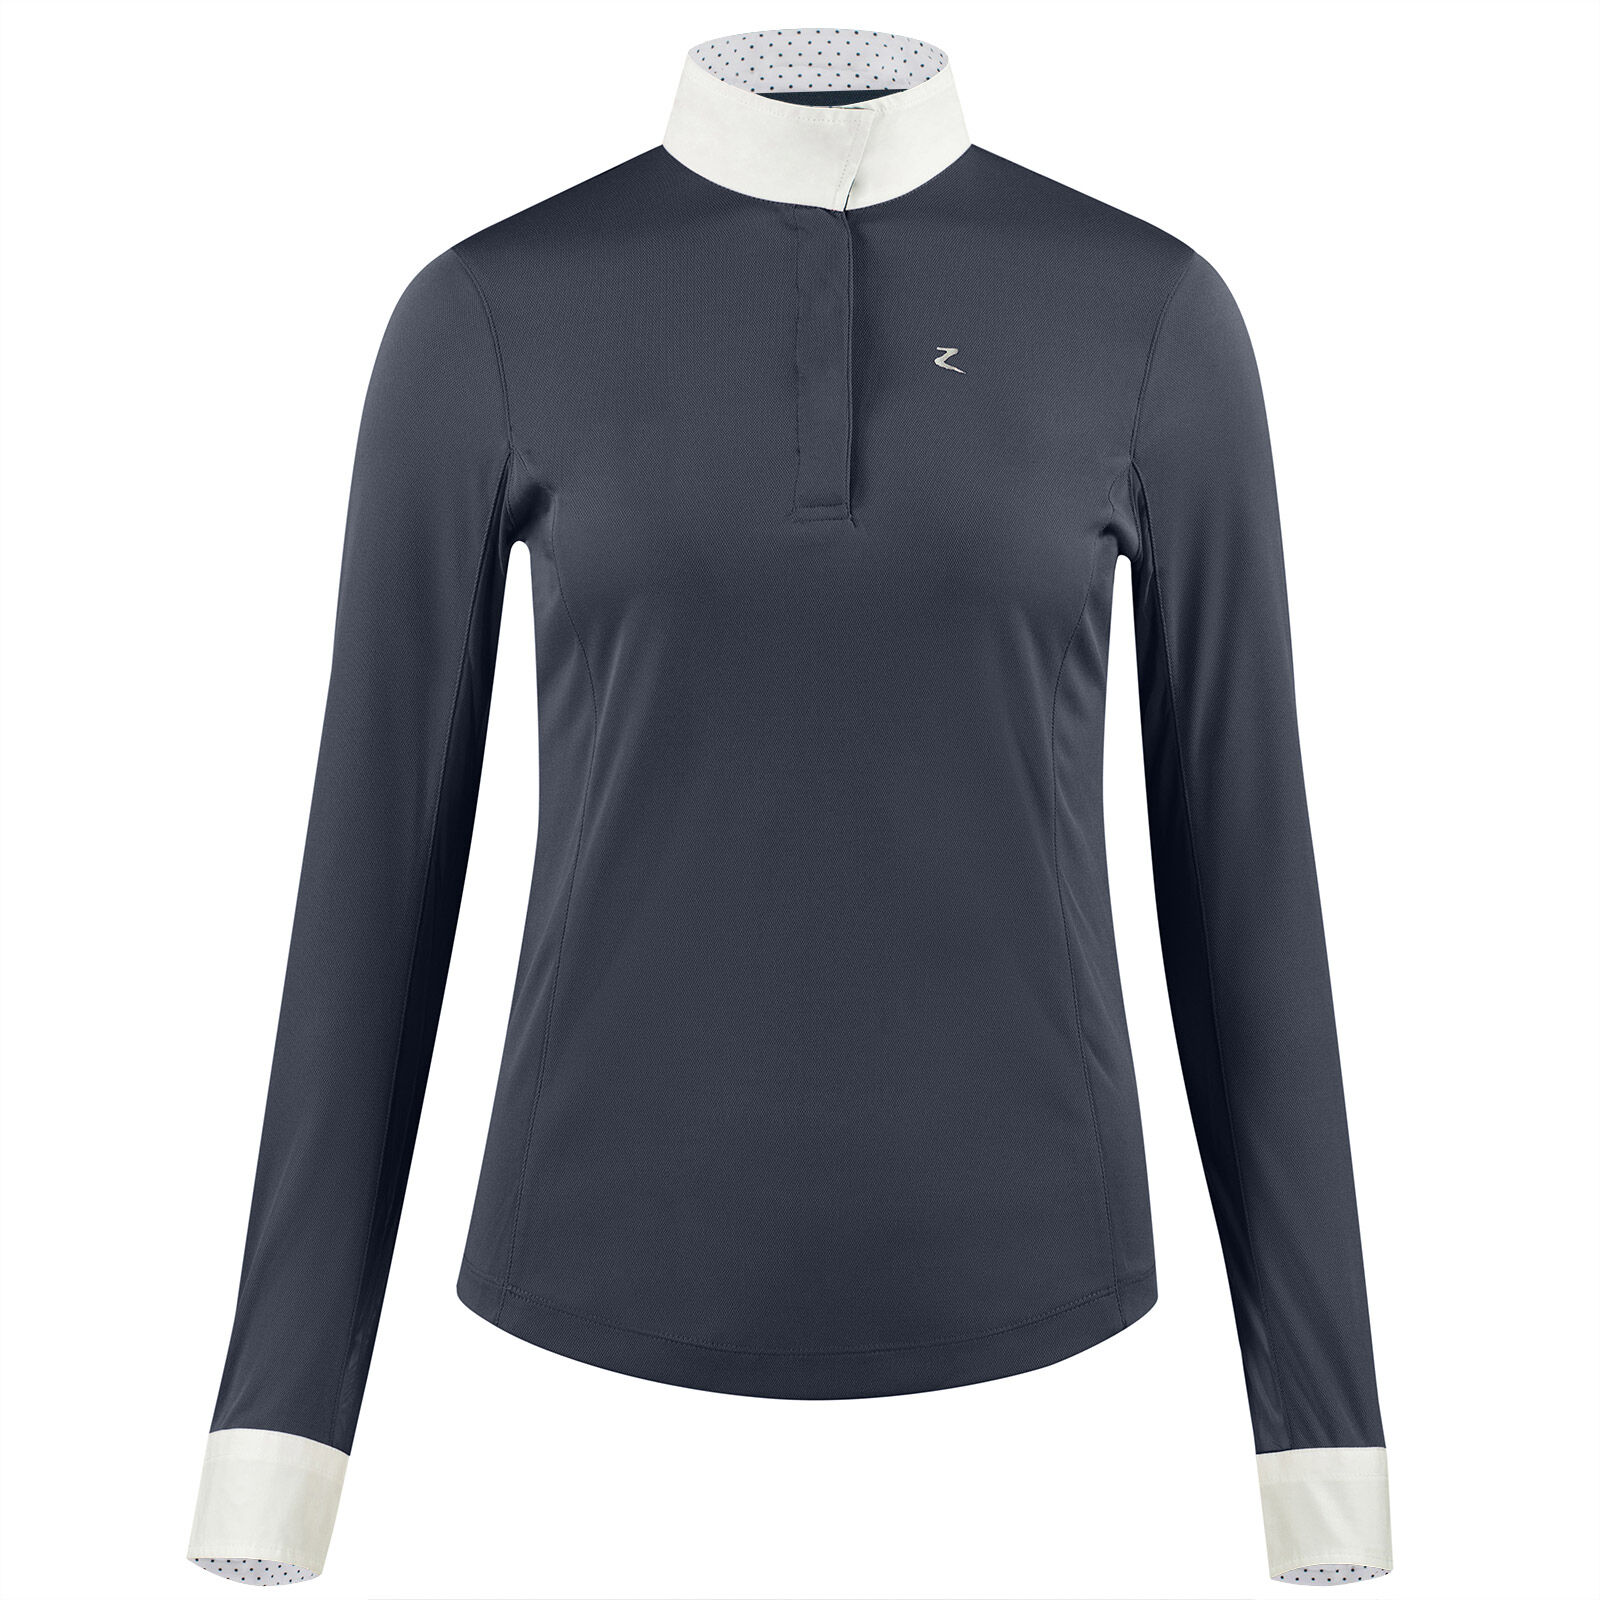 Requisite Damen Klassische Reitshirt Polo Shirt Polohemd Kurzarm Bequem Sitzend